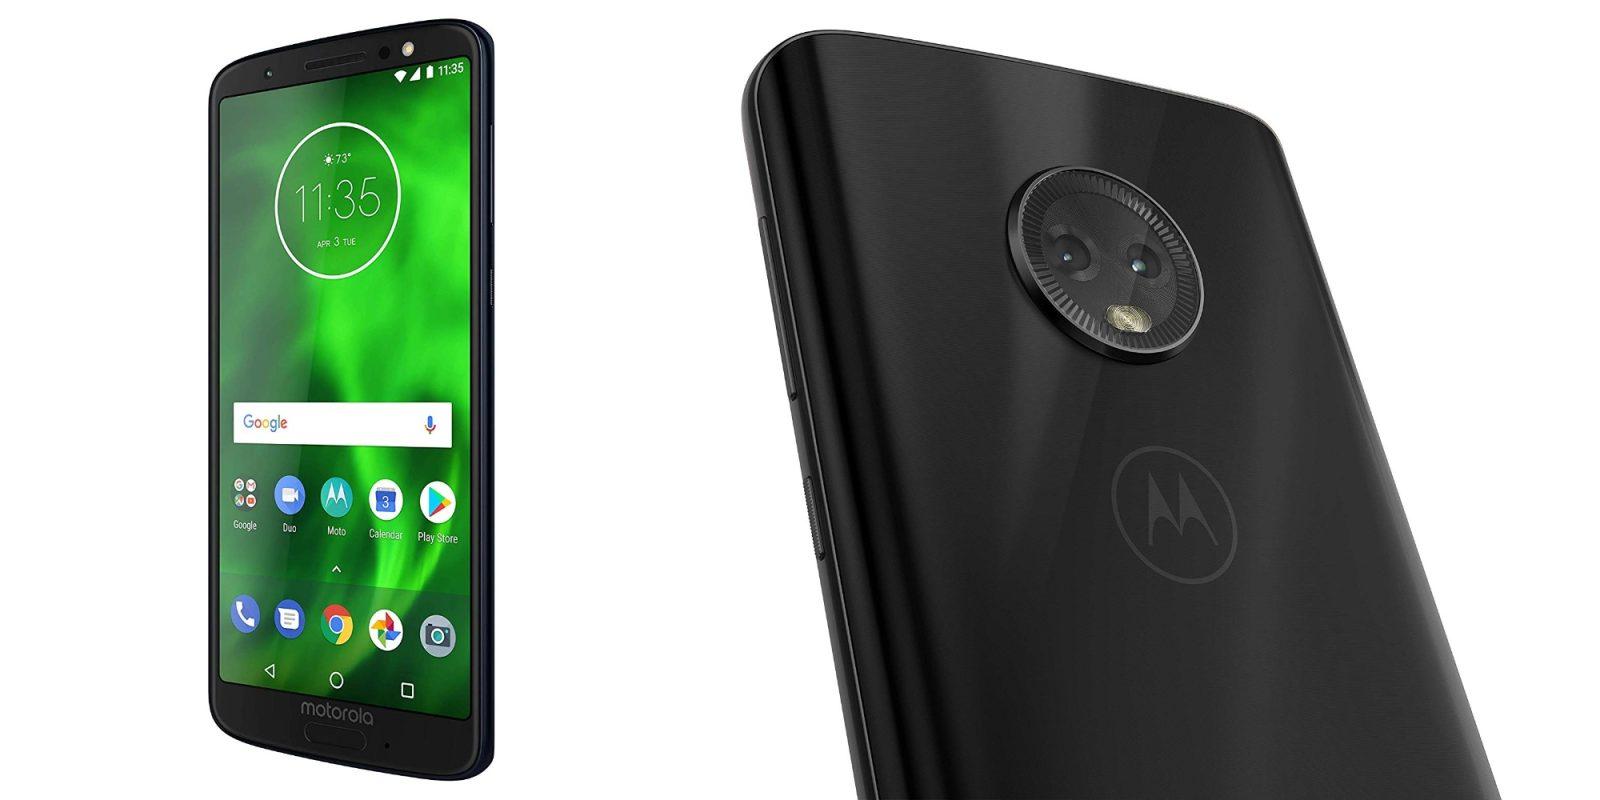 Motorola's Moto G6 Smartphone drops to new Amazon low at $161 (30% off)